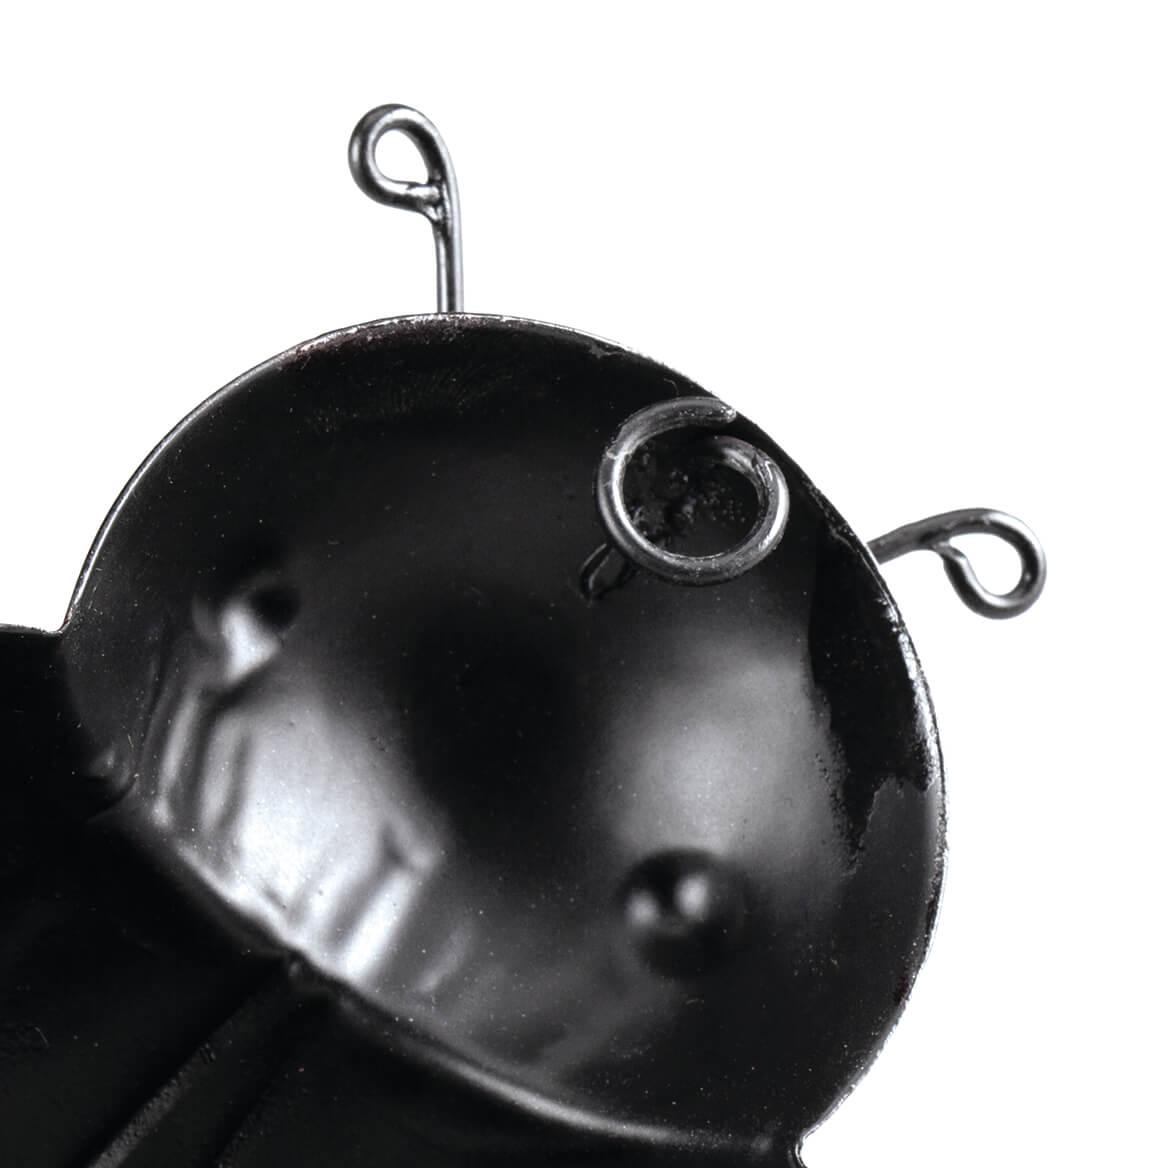 Metal Ladybug Hangers, Set of 4 by Fox River™ Creations-371199